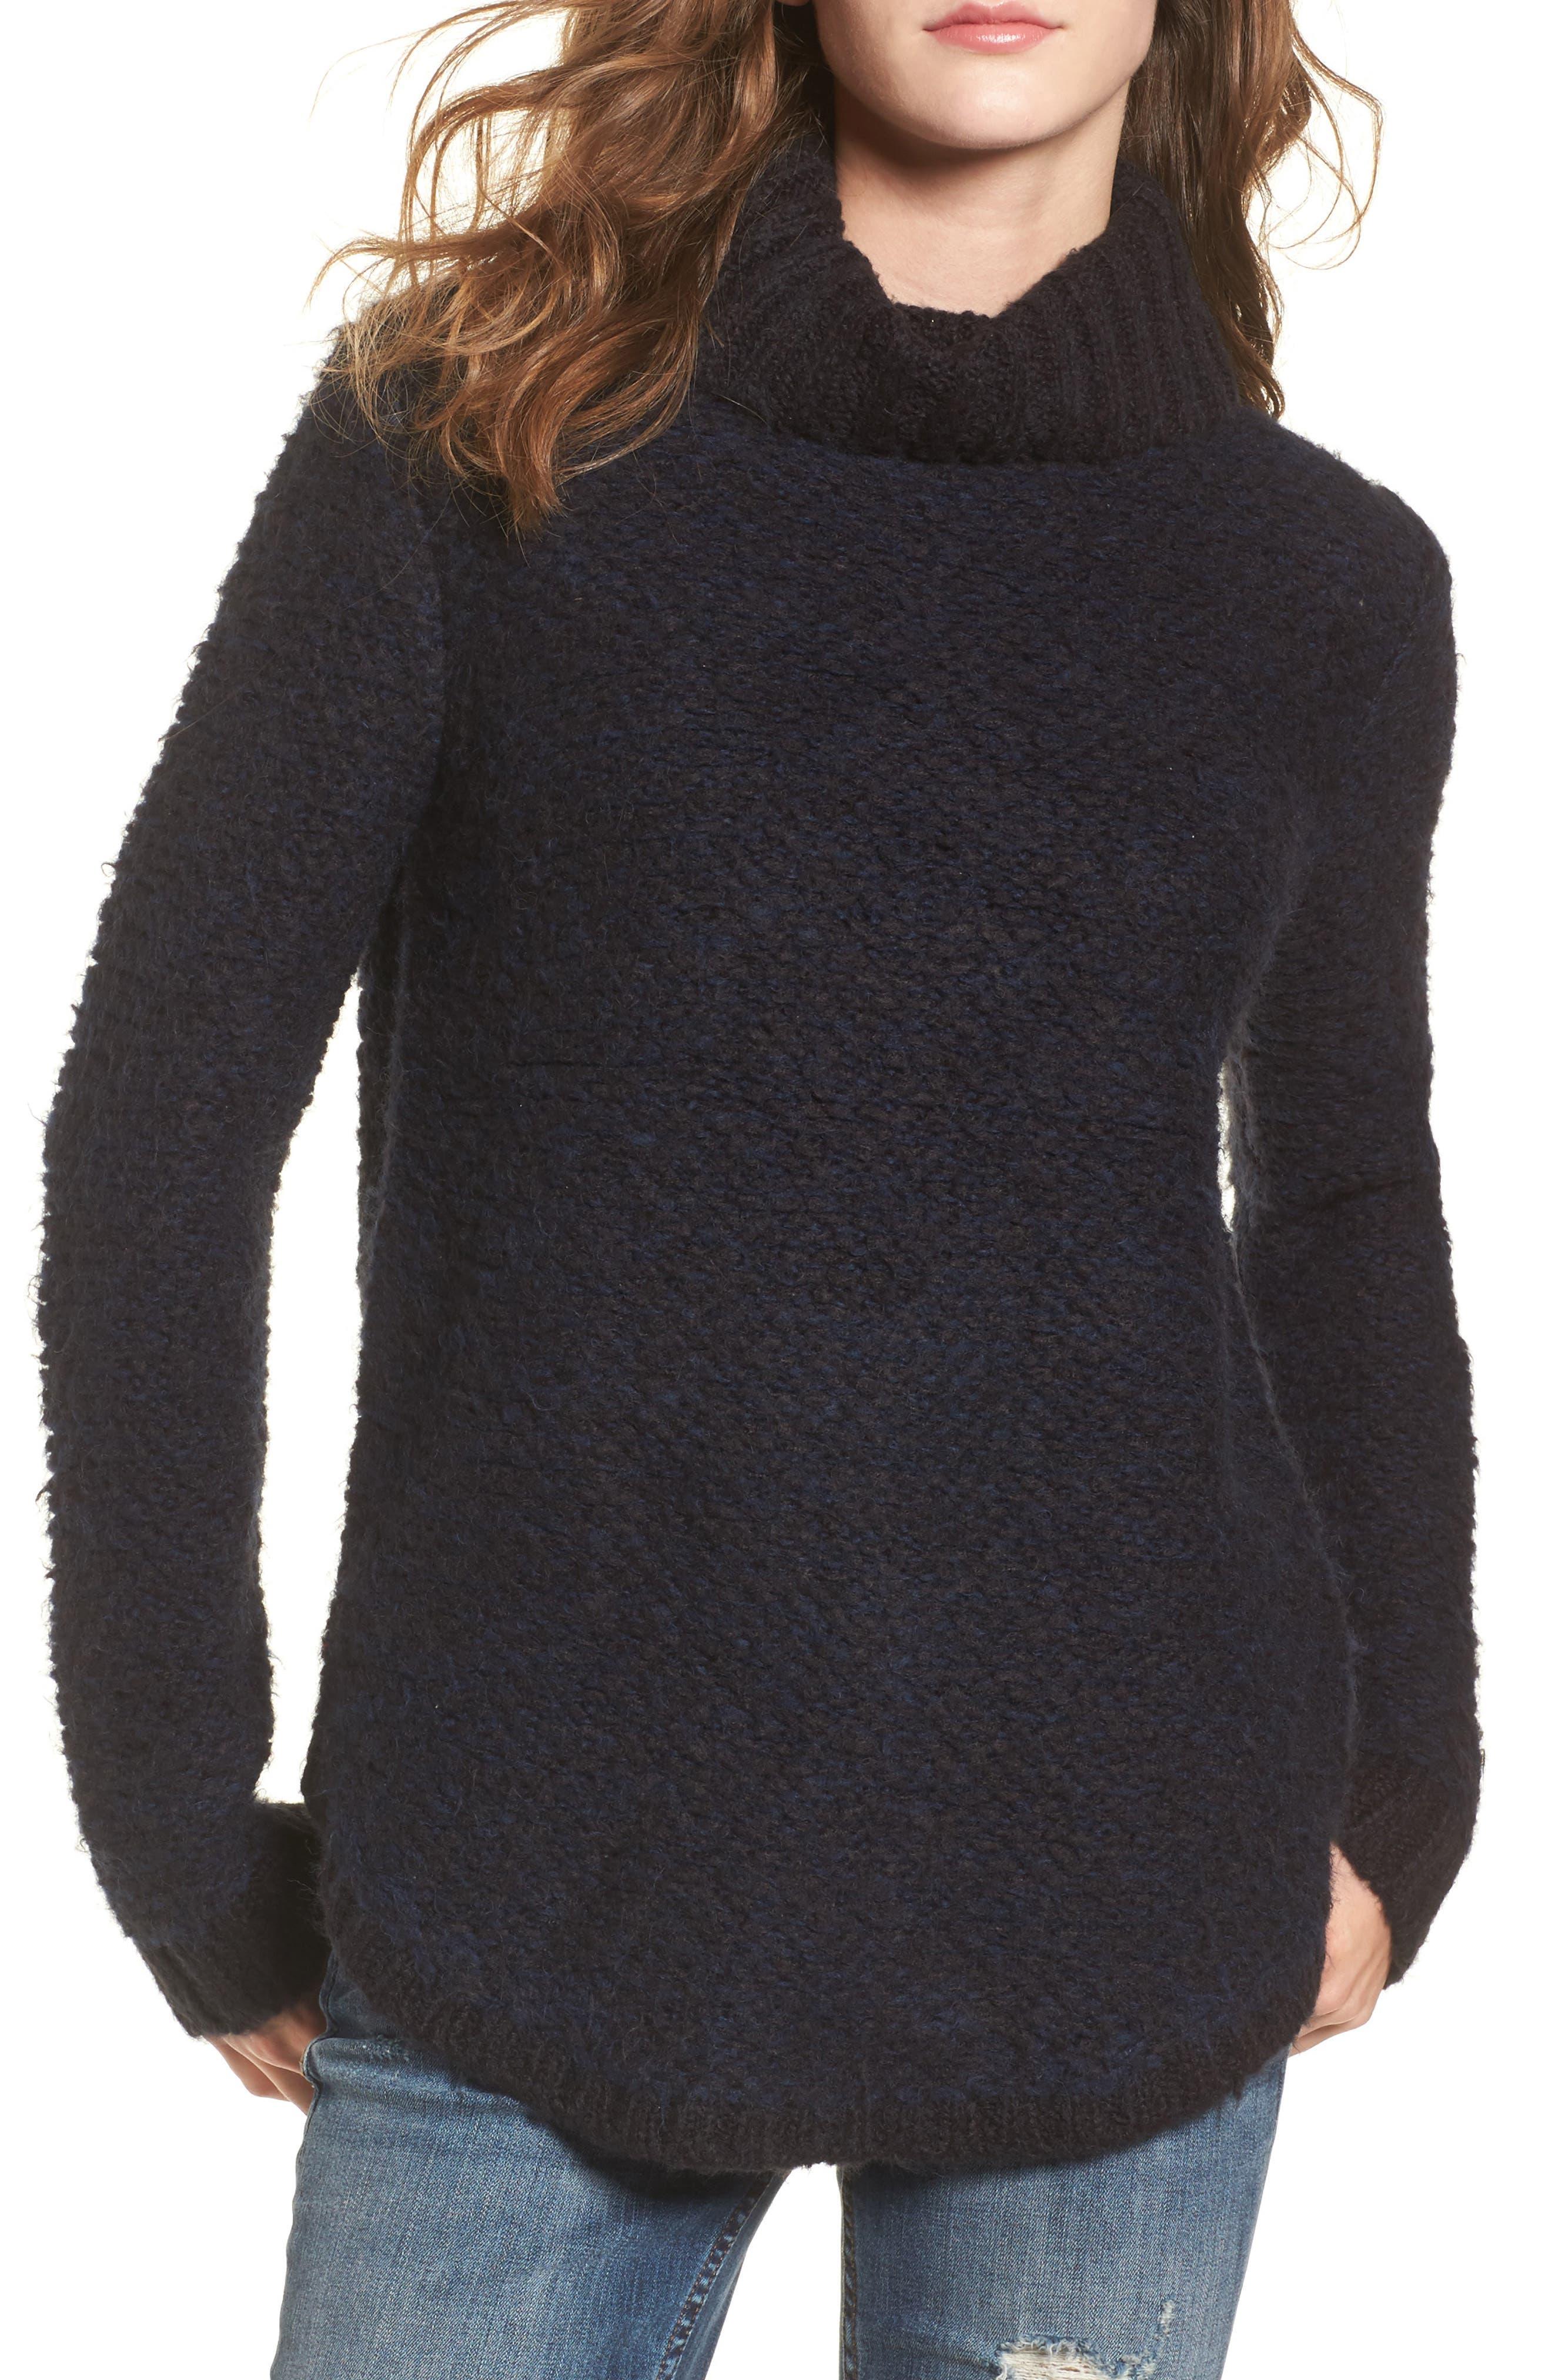 Kinks Turtleneck Sweater,                         Main,                         color, Black